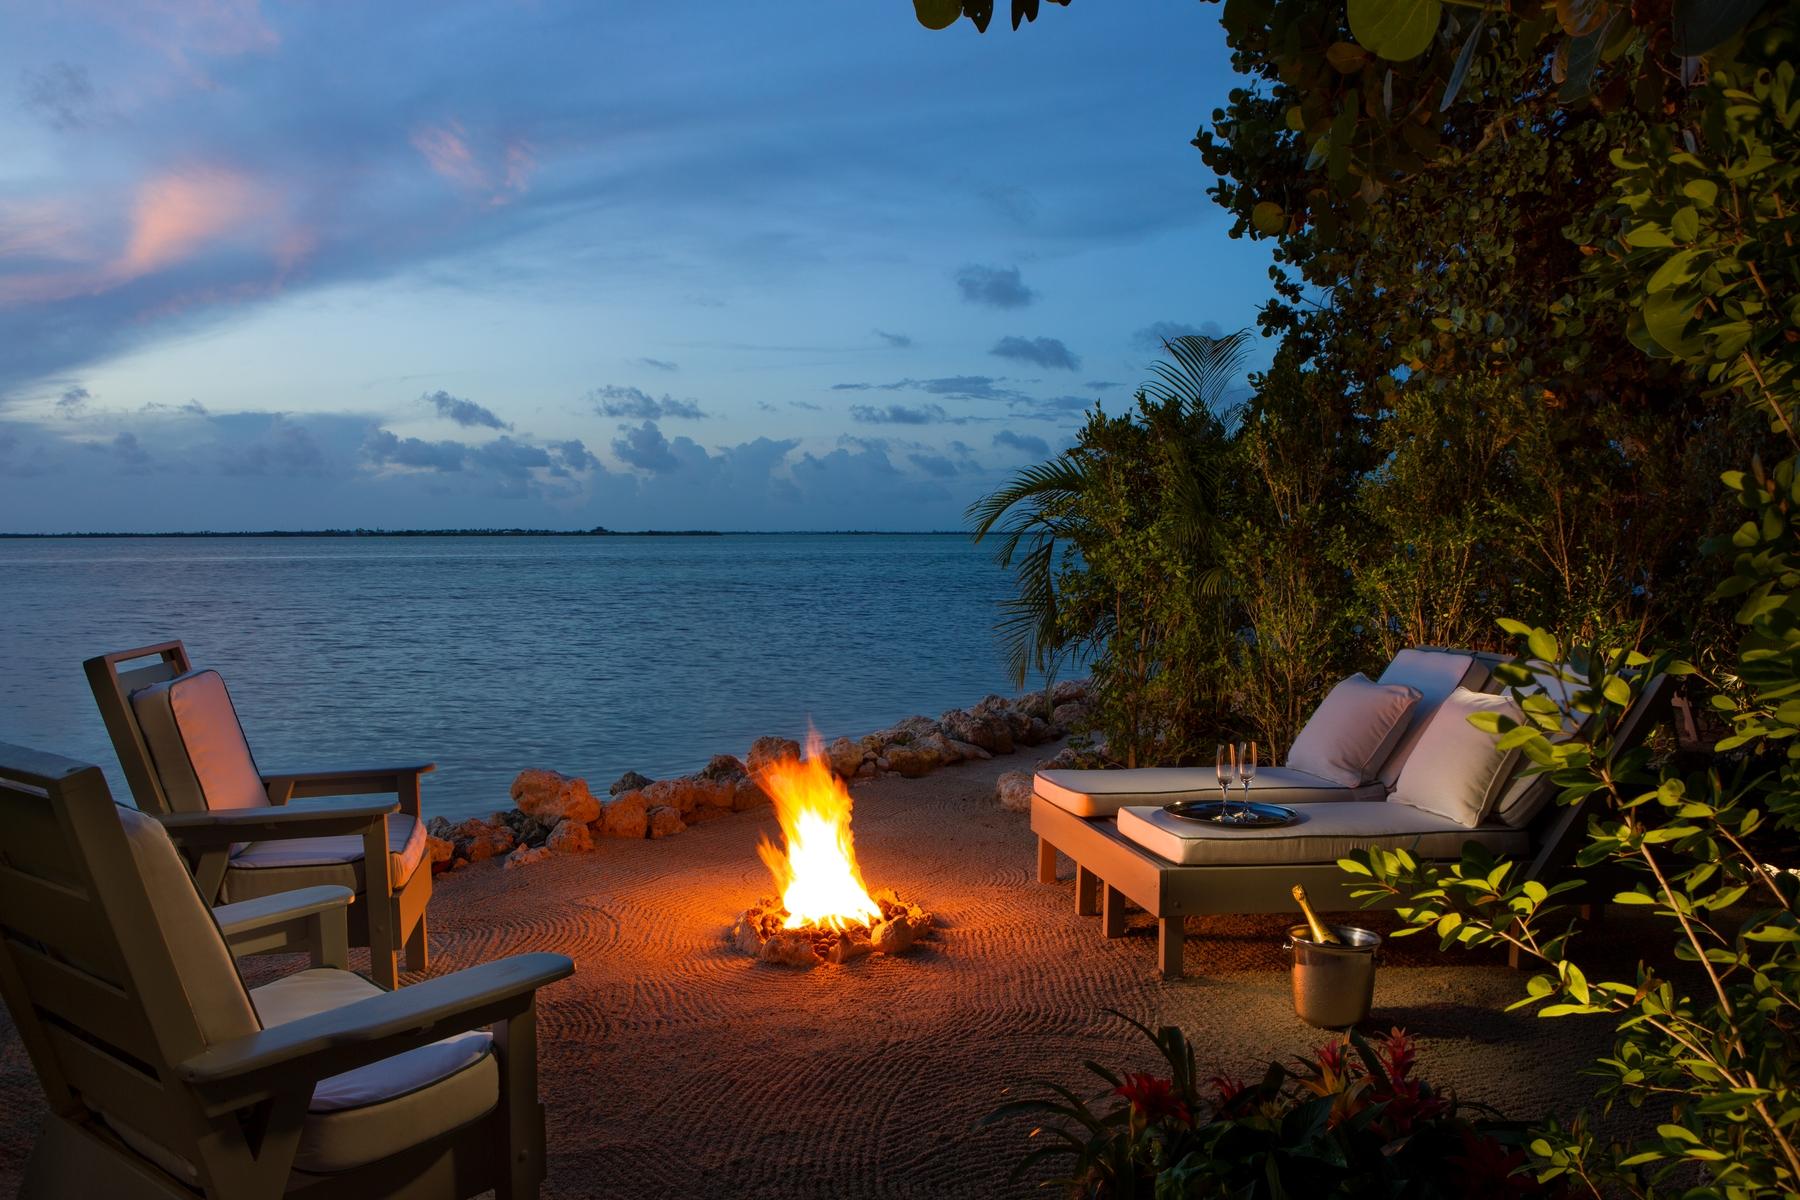 Bonfire at Little Palm Island Resort & Spa in Florida